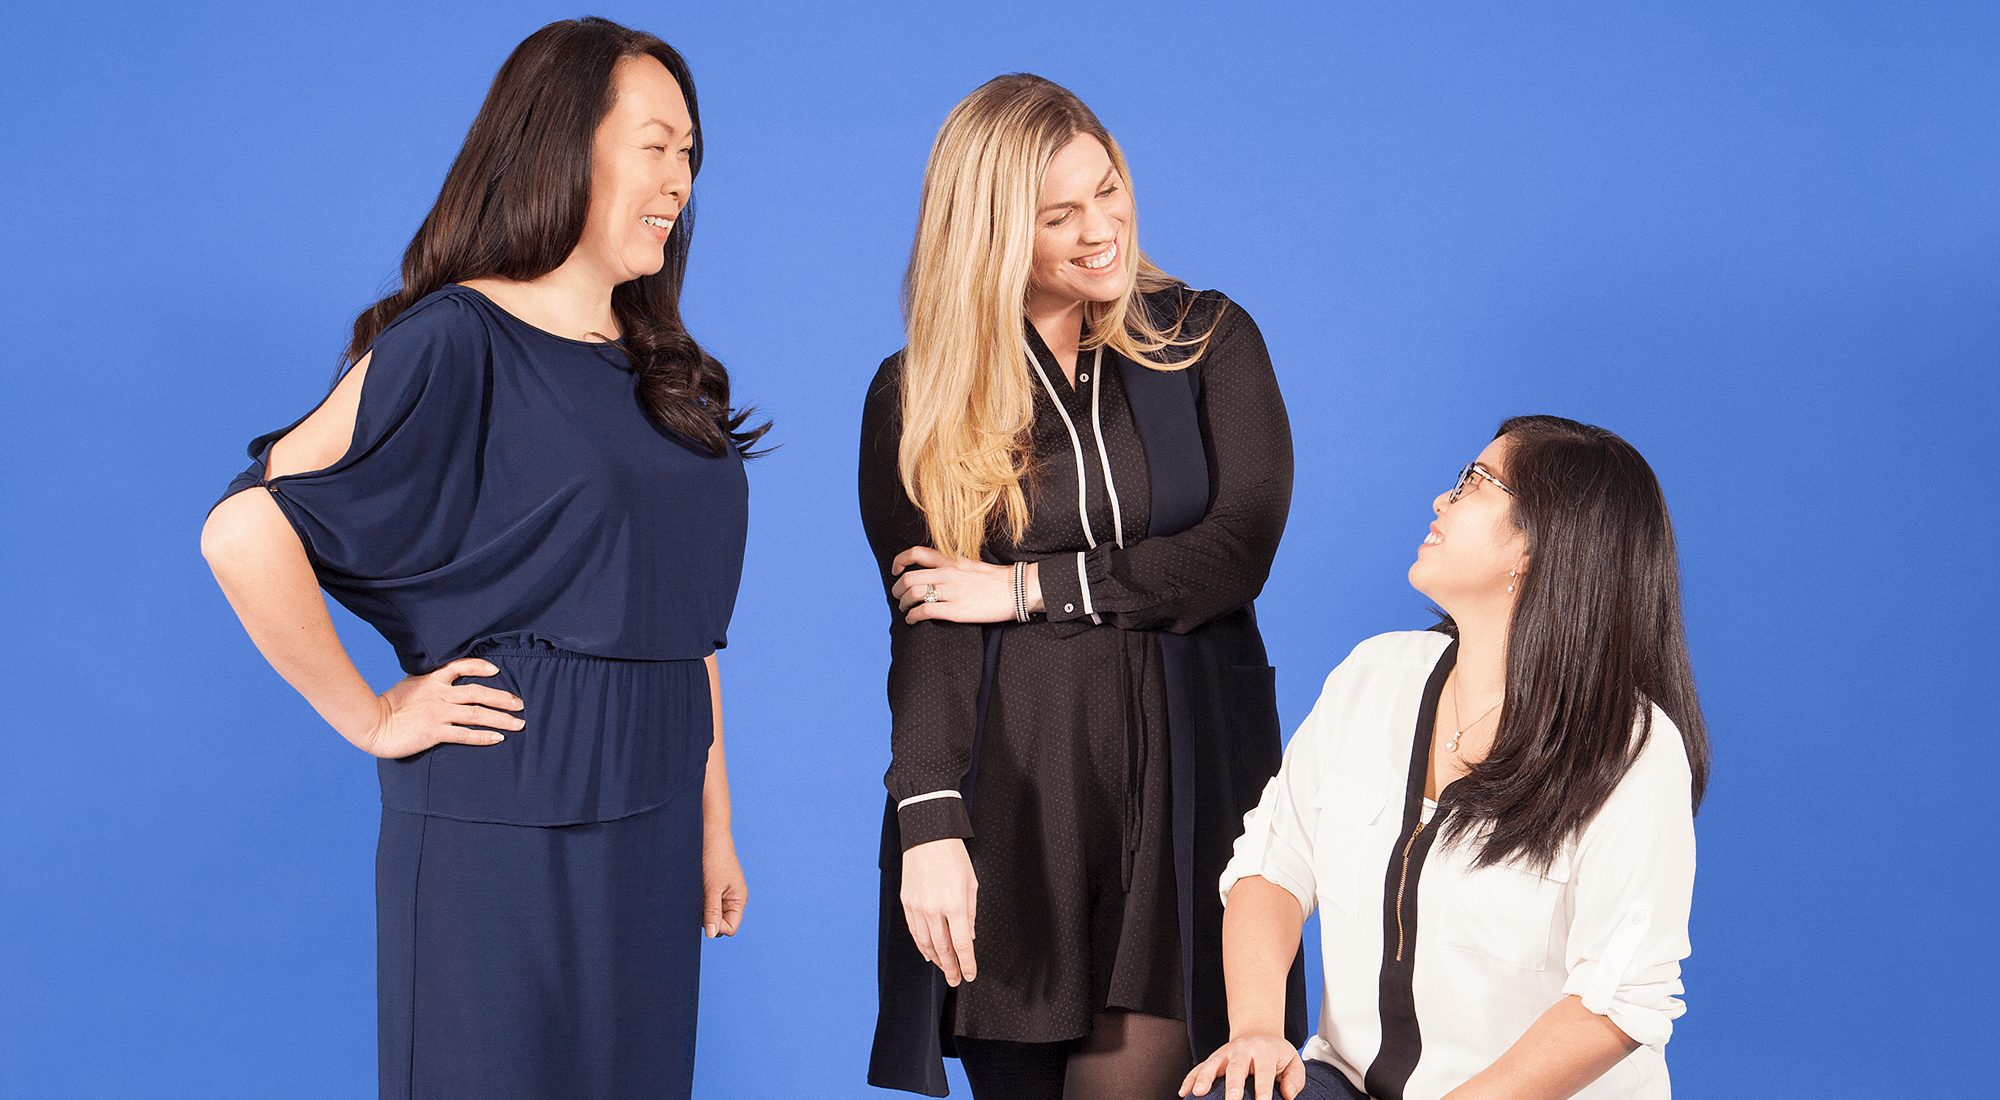 These women entrepreneurs are boldly going where men fear to tread